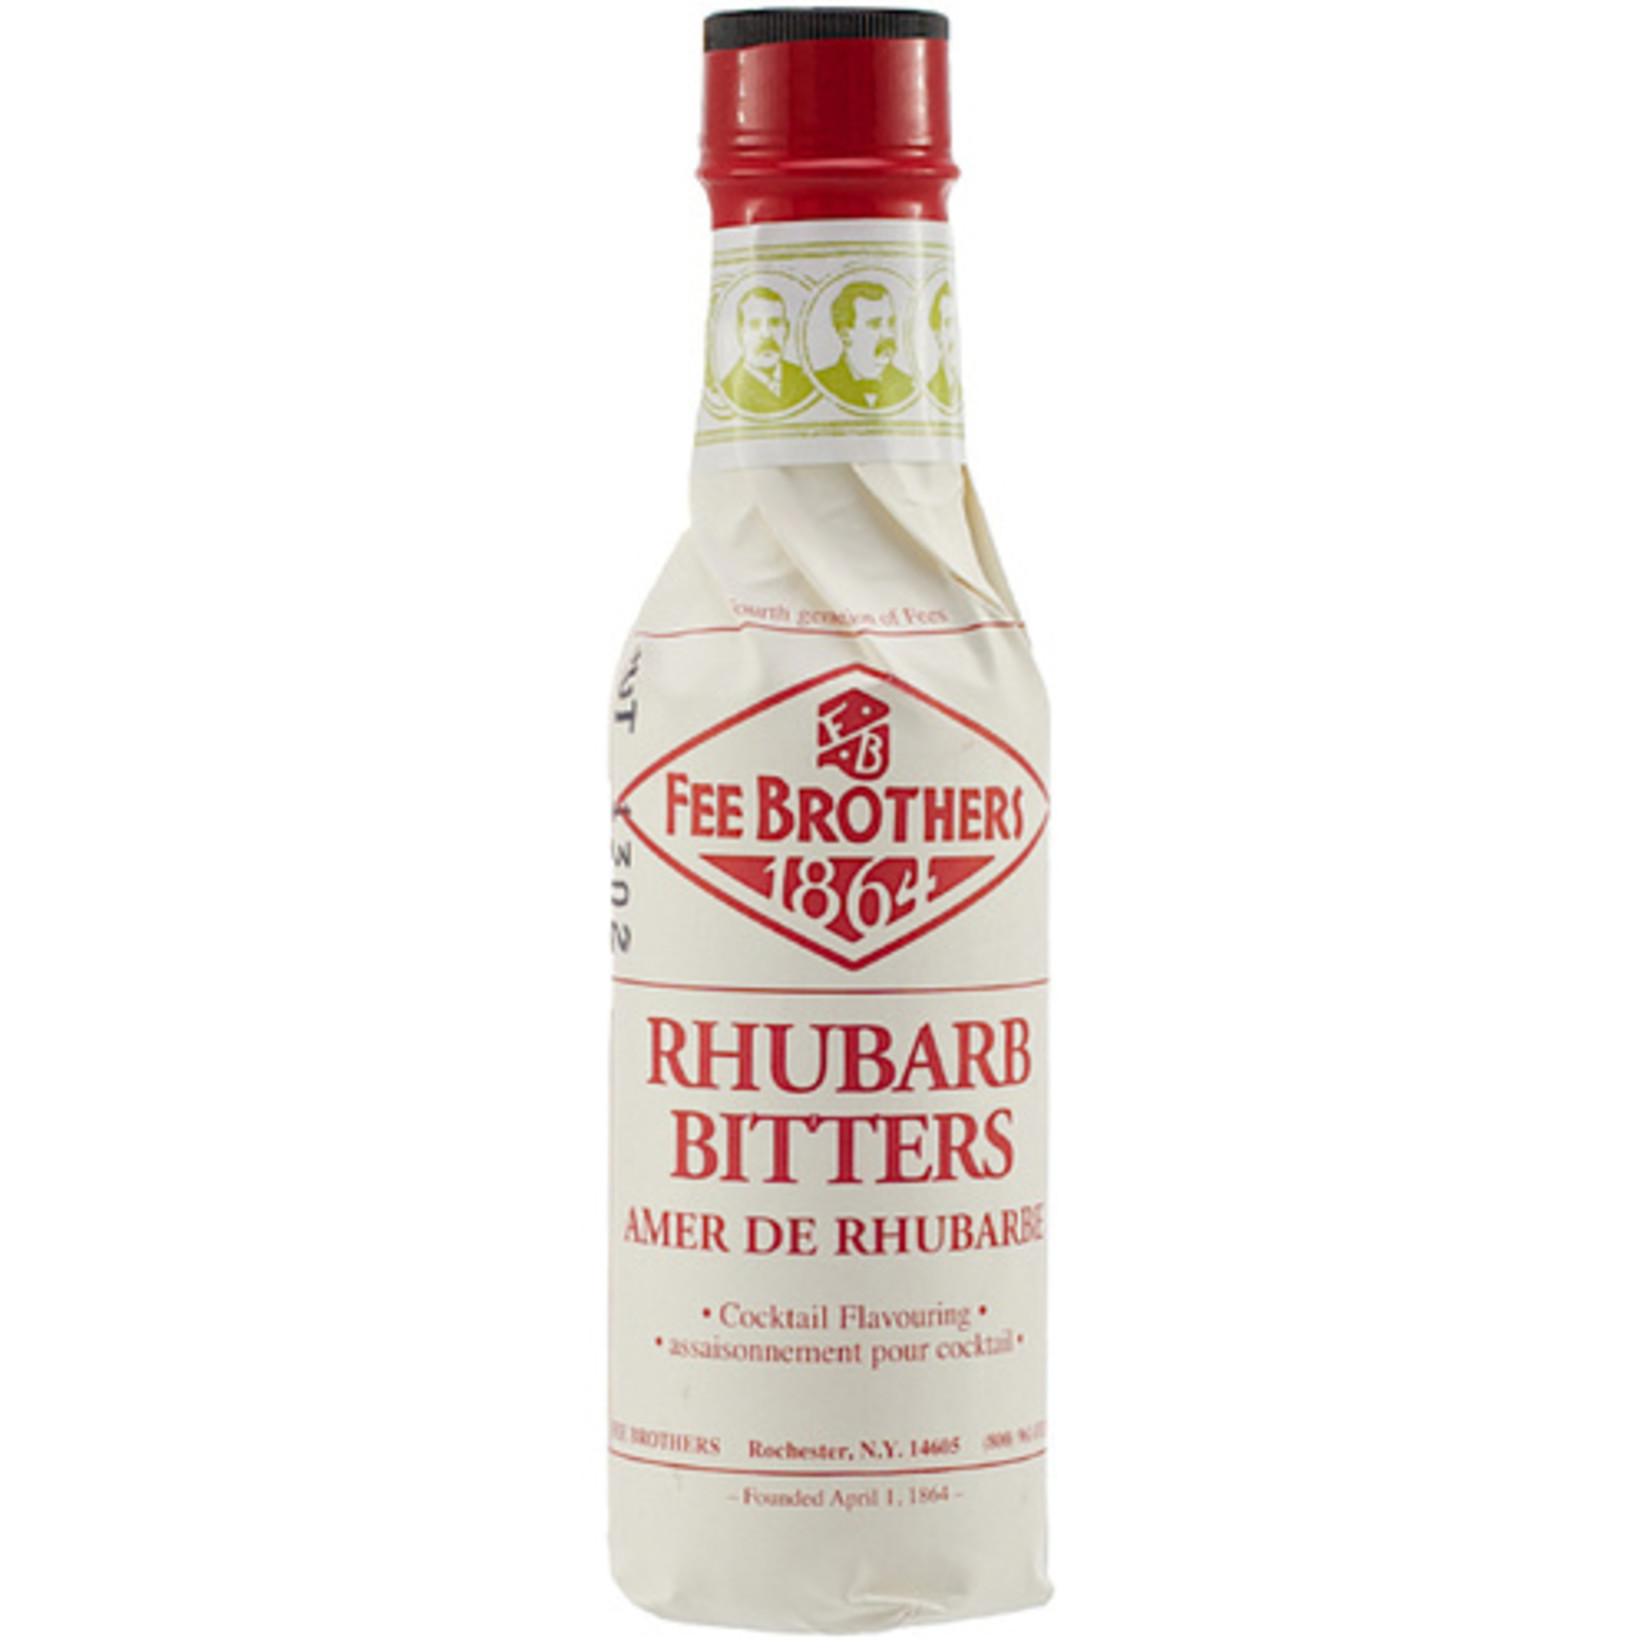 Fee Brothers Fee Brothers Bitters Rhubarb